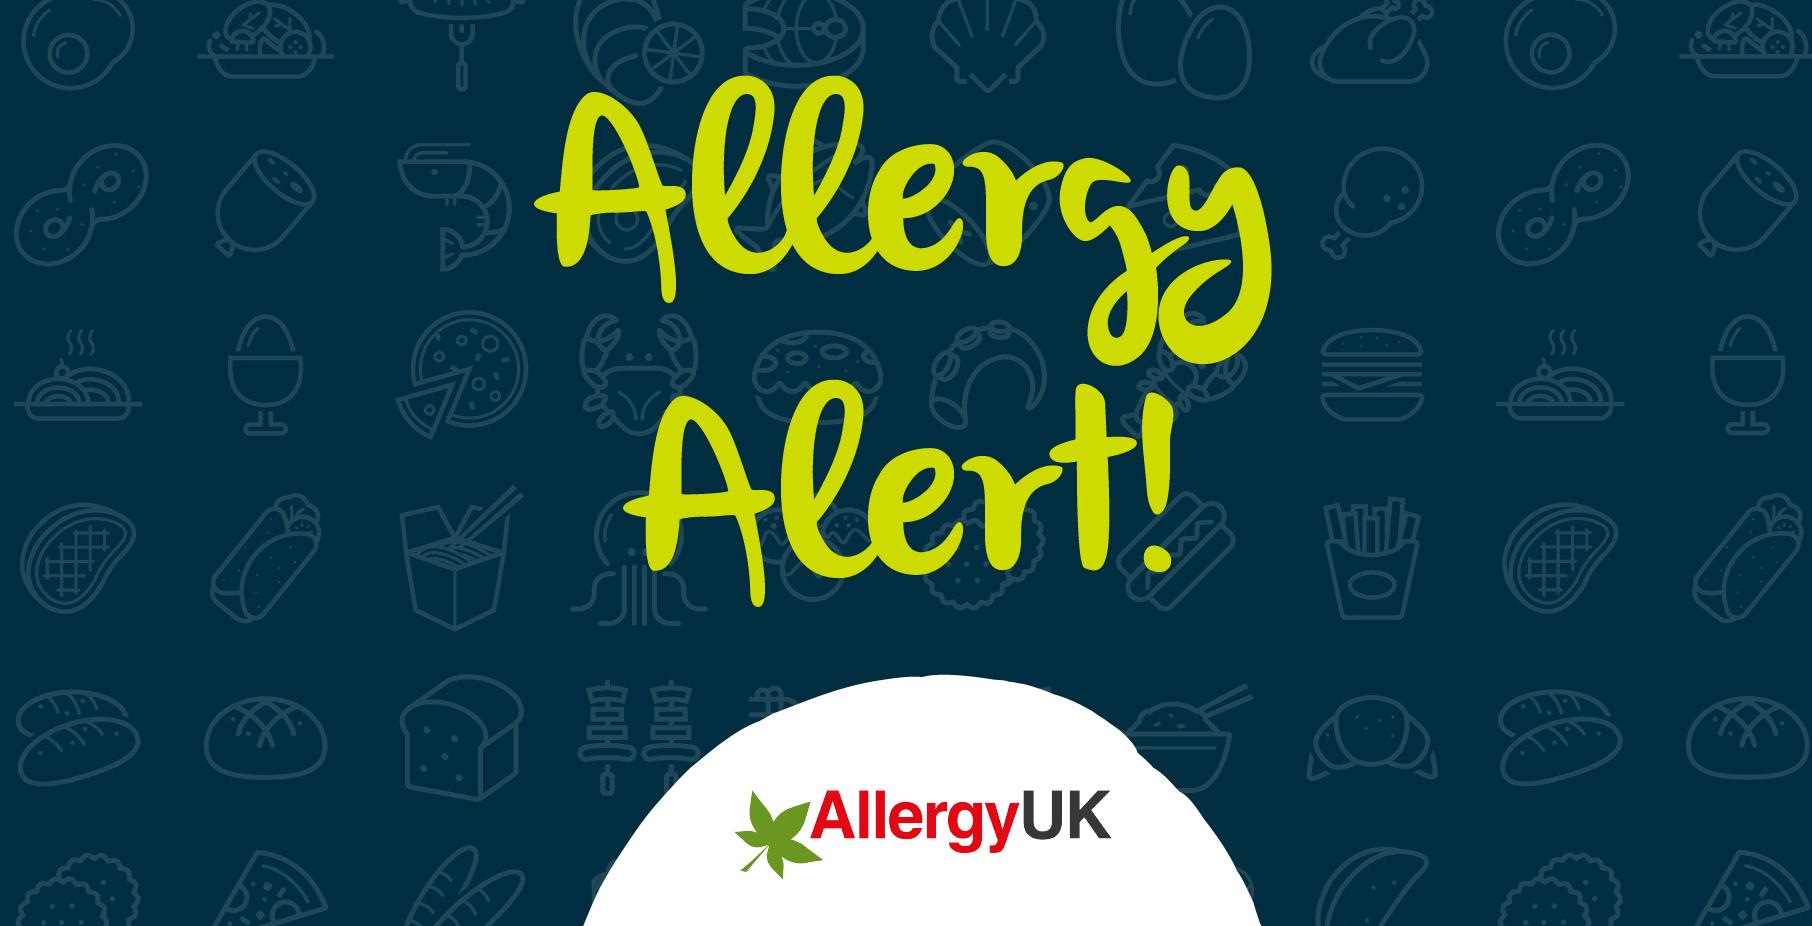 Allergy Alert - SPAR Crispy Breaded Haddock Fillets and SPAR Crispy Breaded Cod Fillets